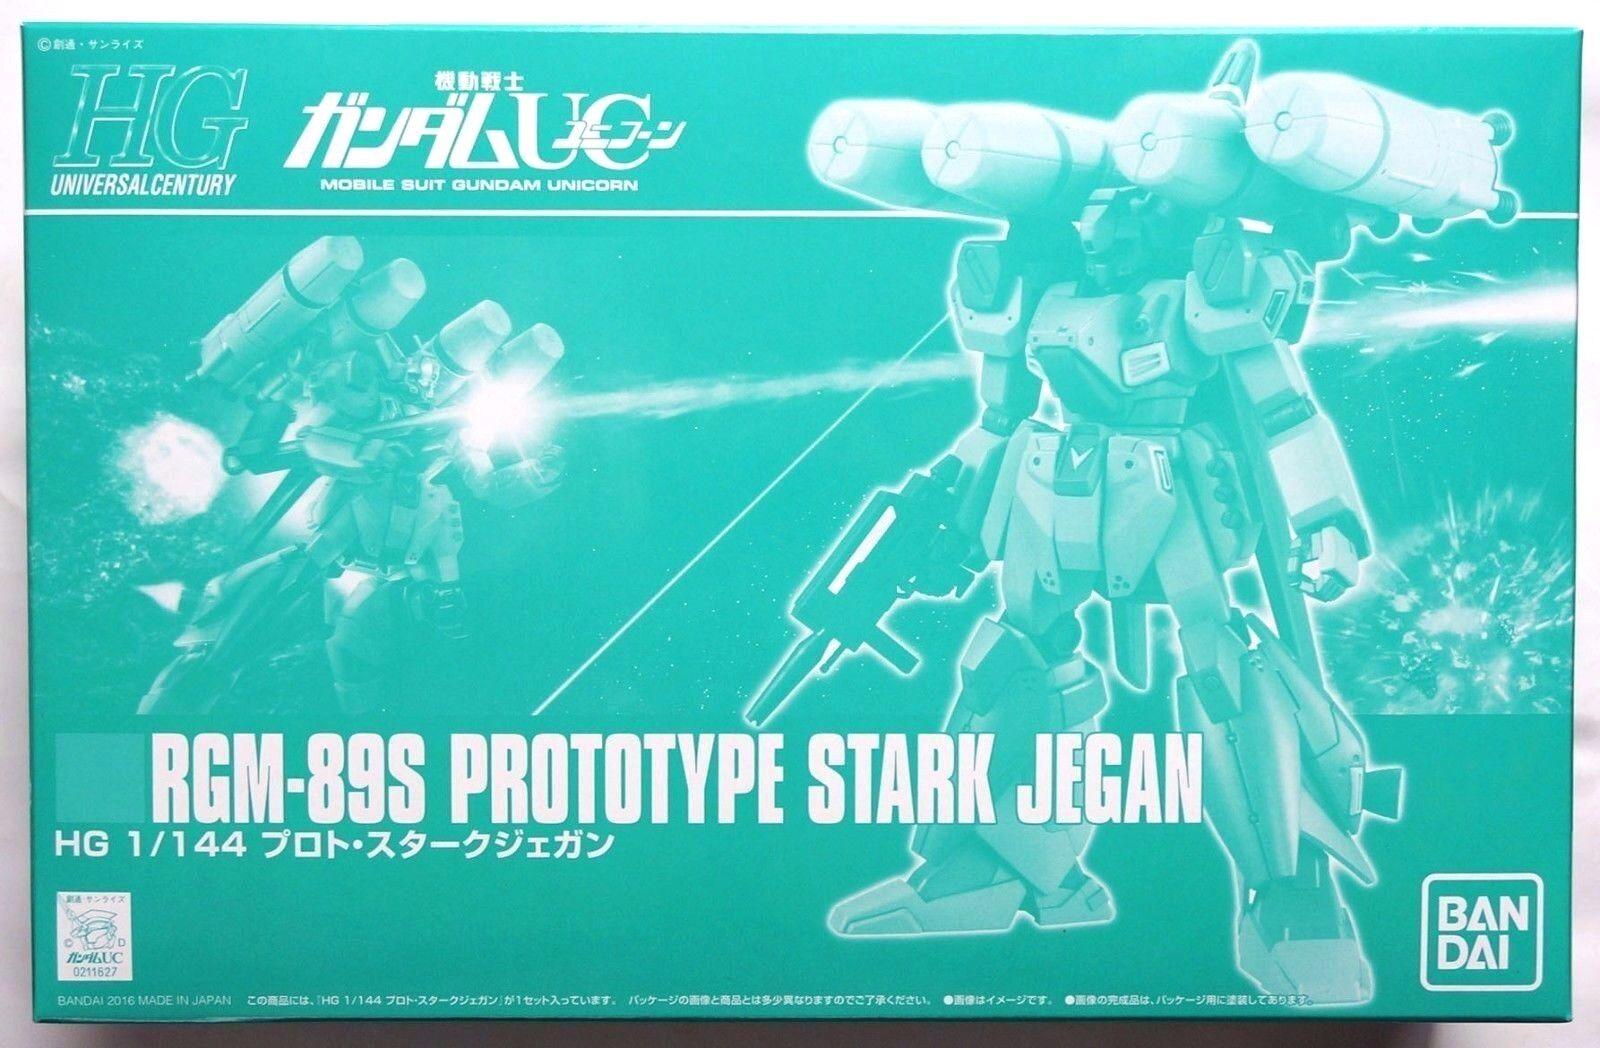 BANDAI HGUC 1 144 RGM-89S Predotype Stark Jegan Premium Bandai limited model kit